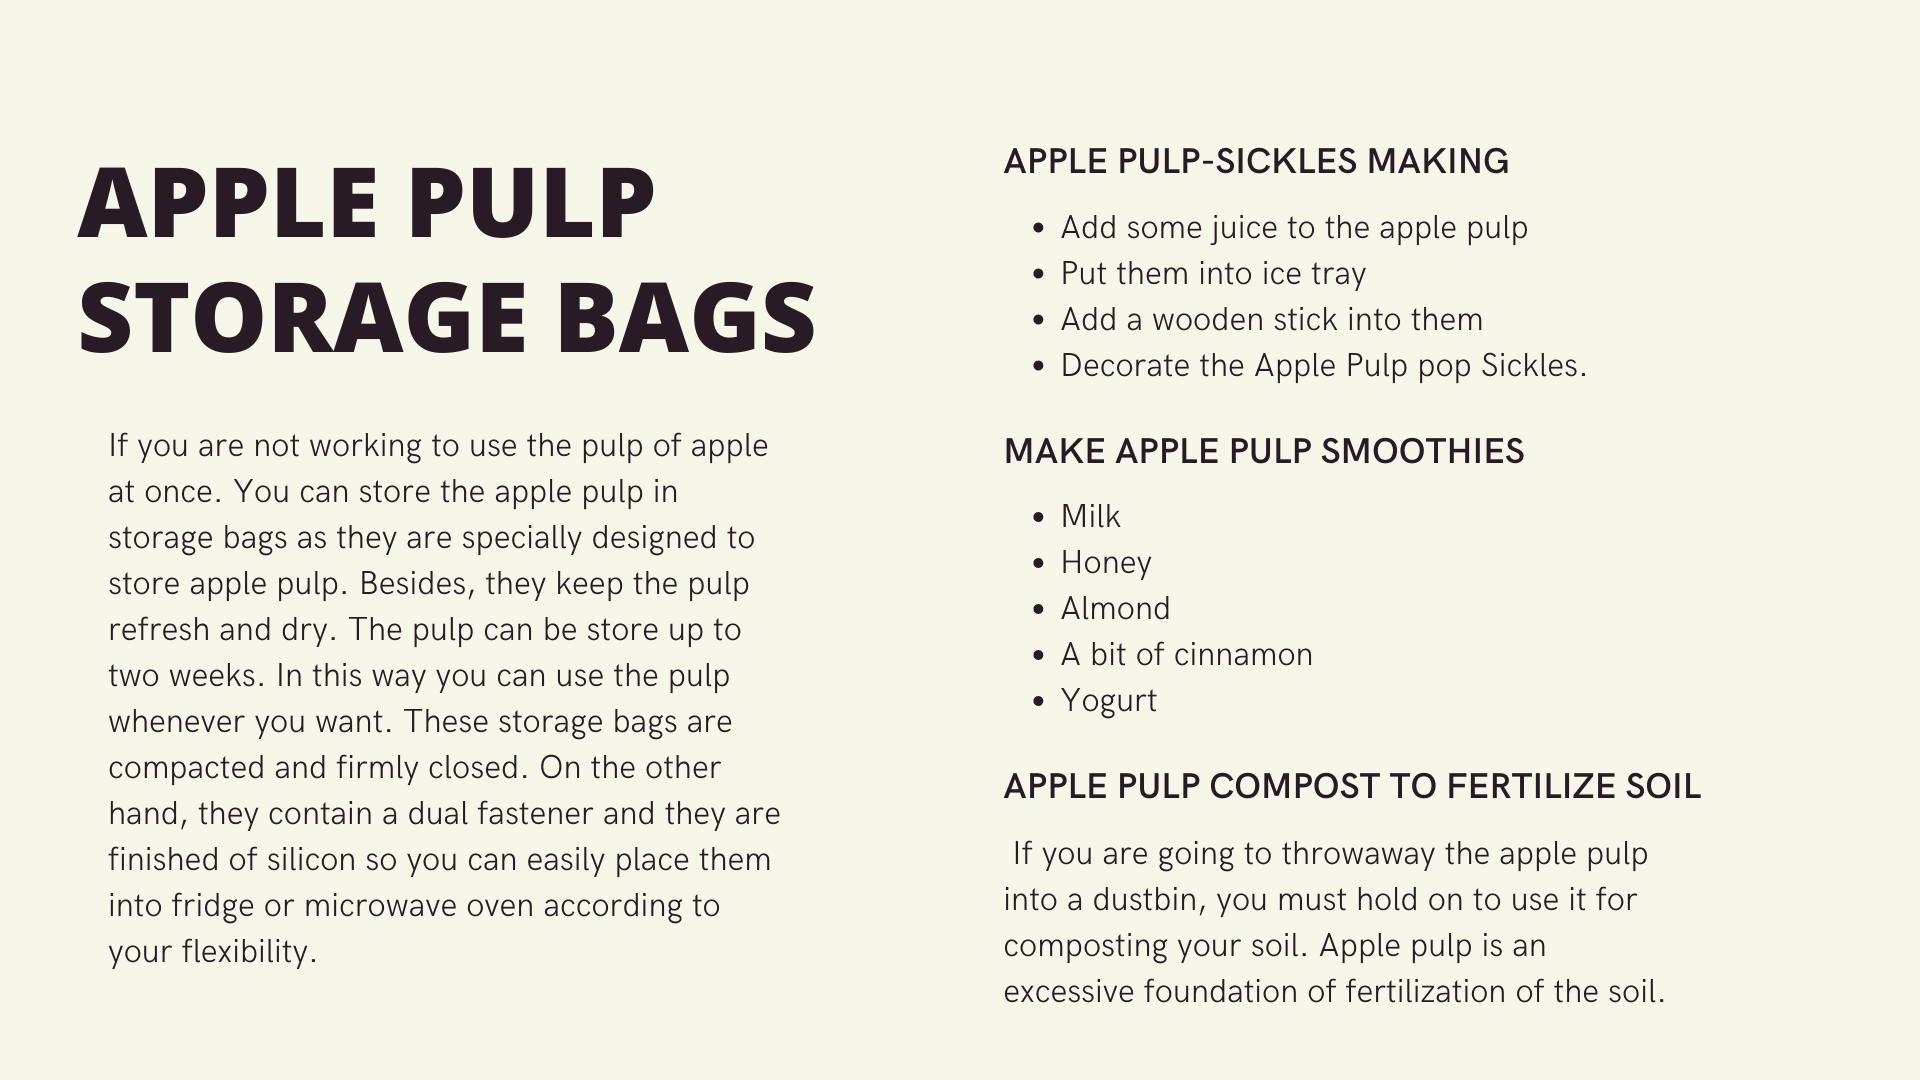 How to utilize the Apple Pulp Juice uniquely